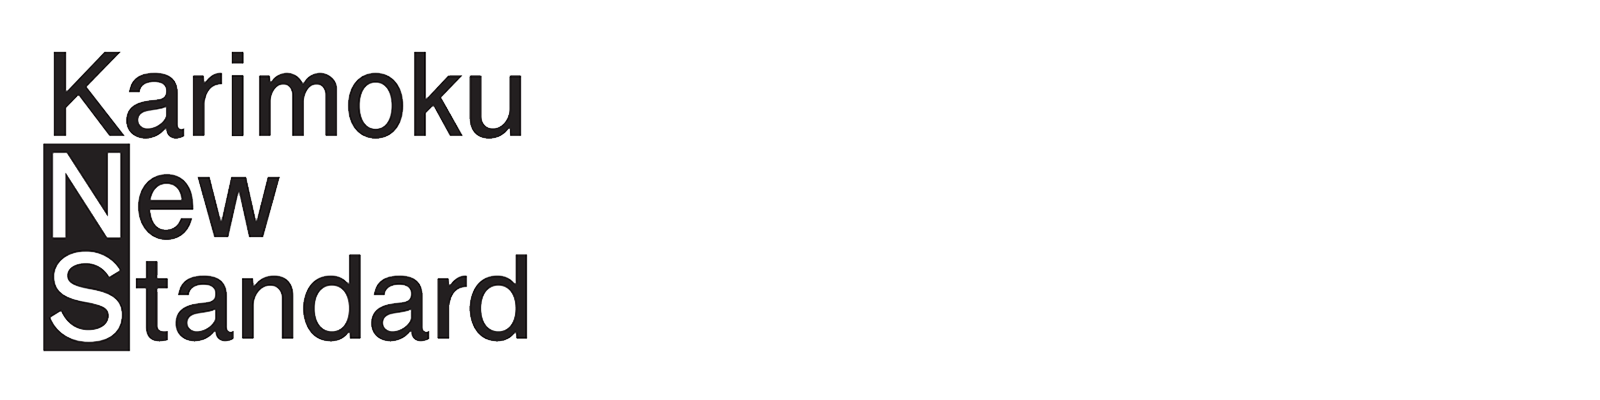 KARIMOKU NEW STANDARD